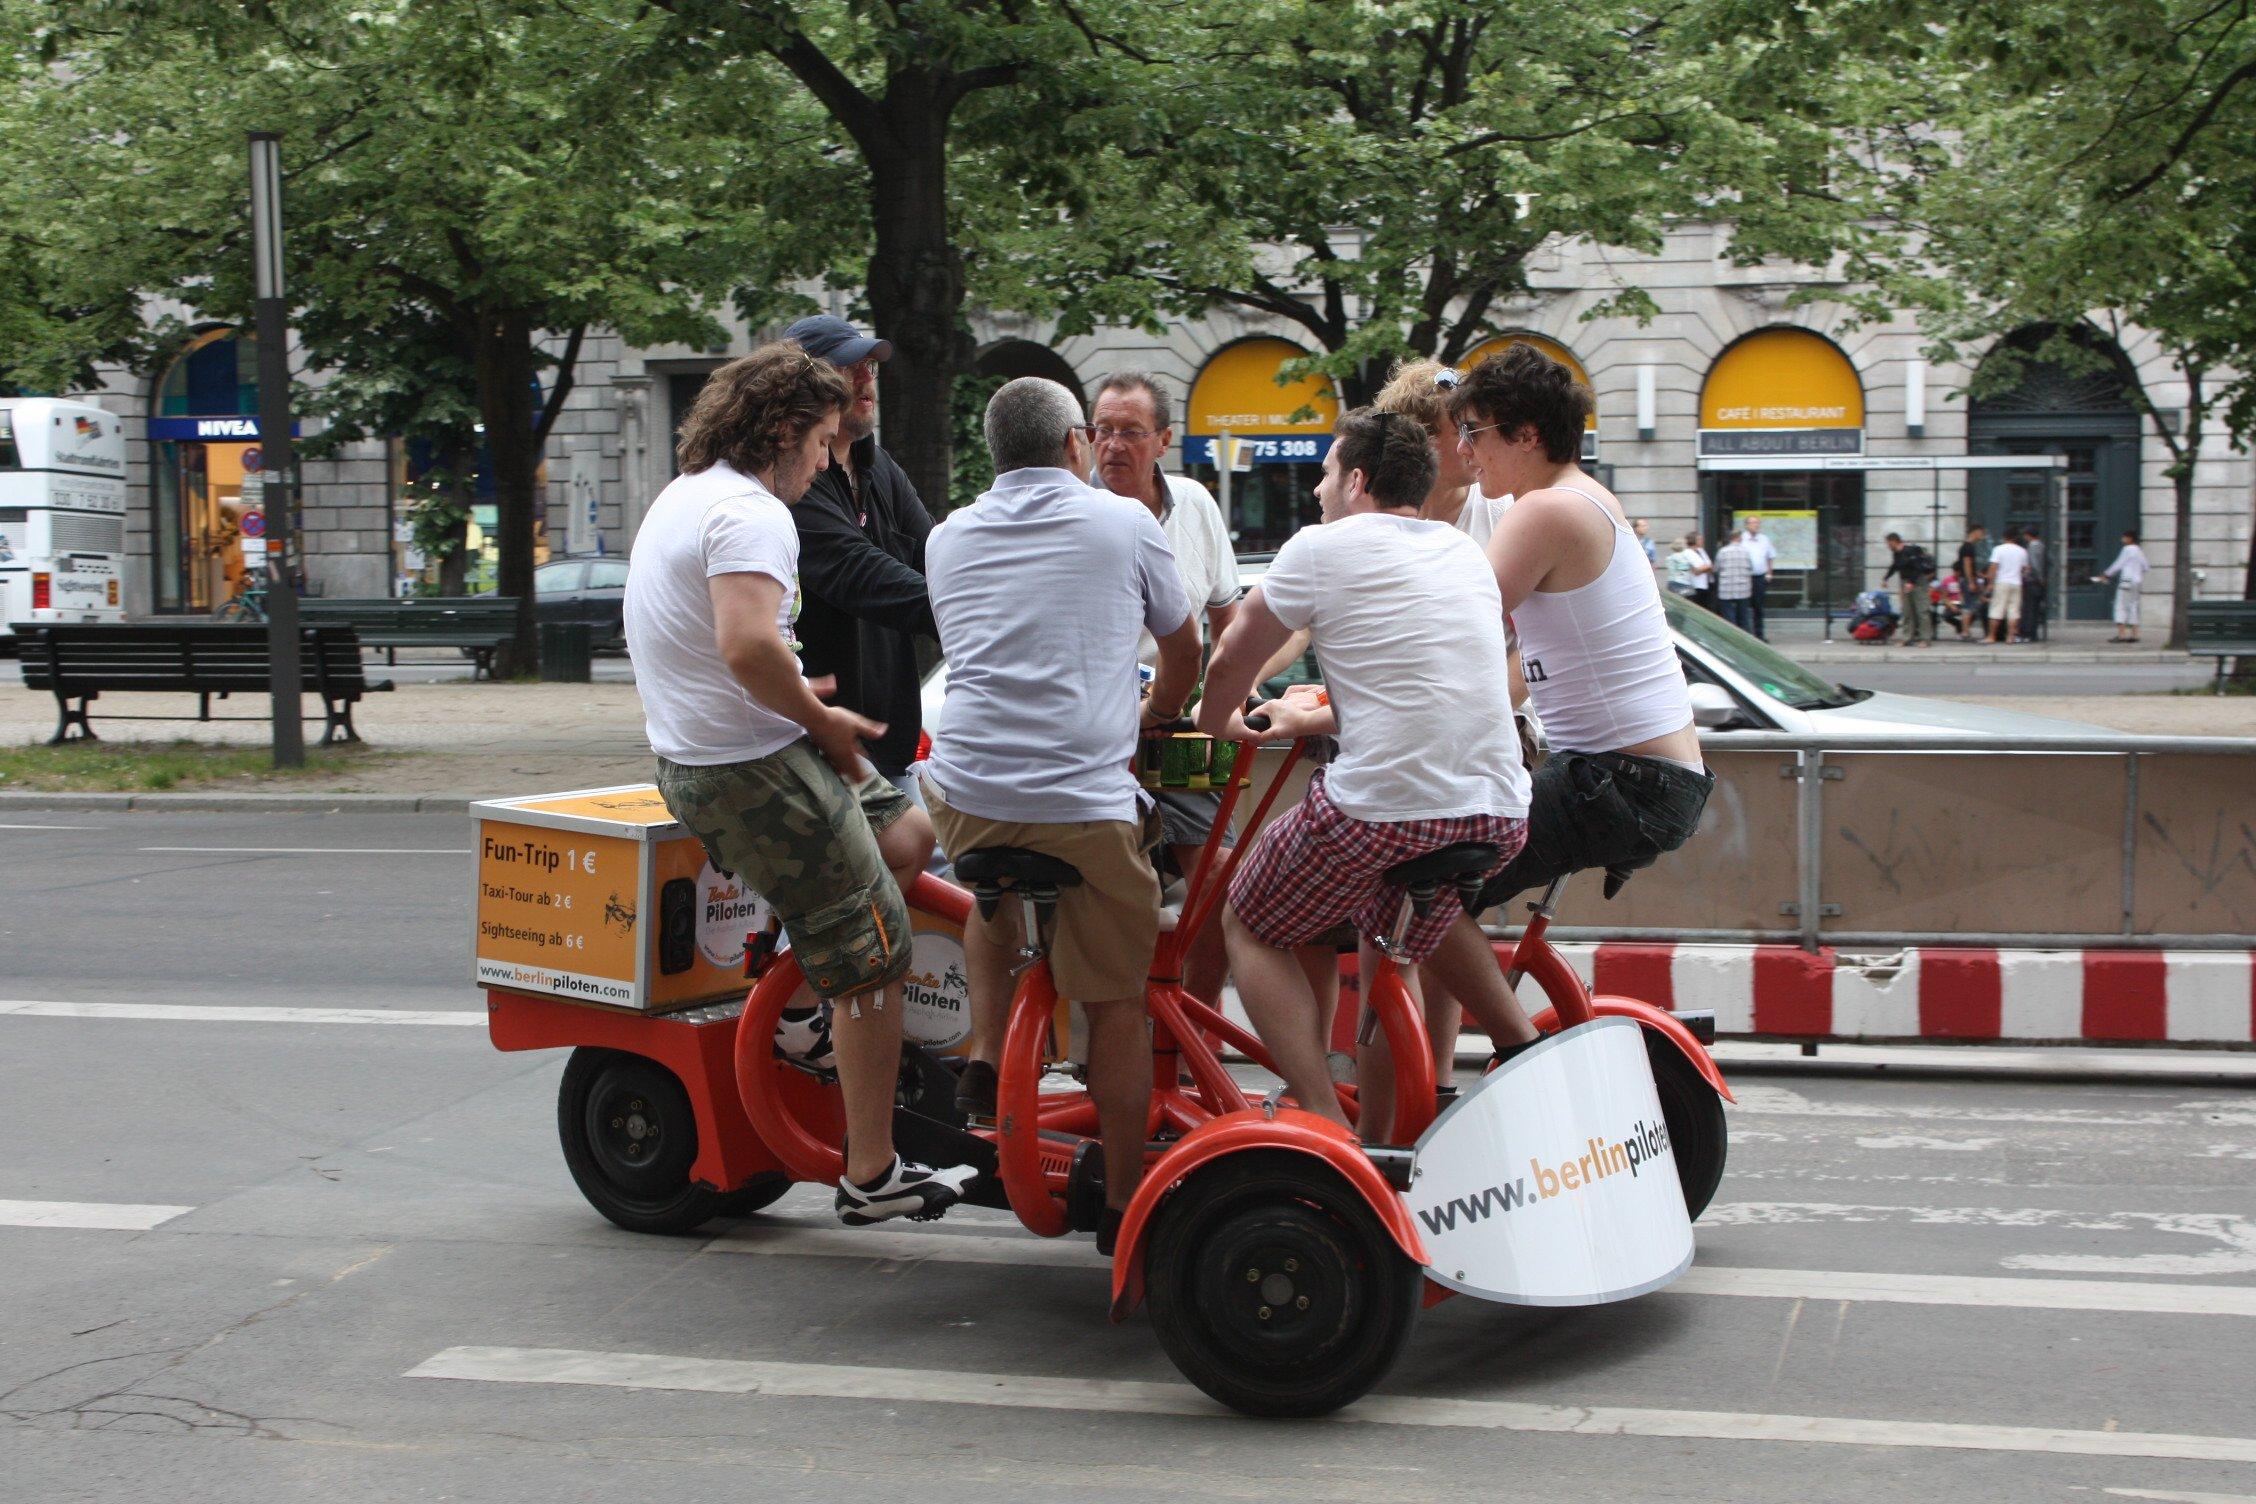 People on a bike